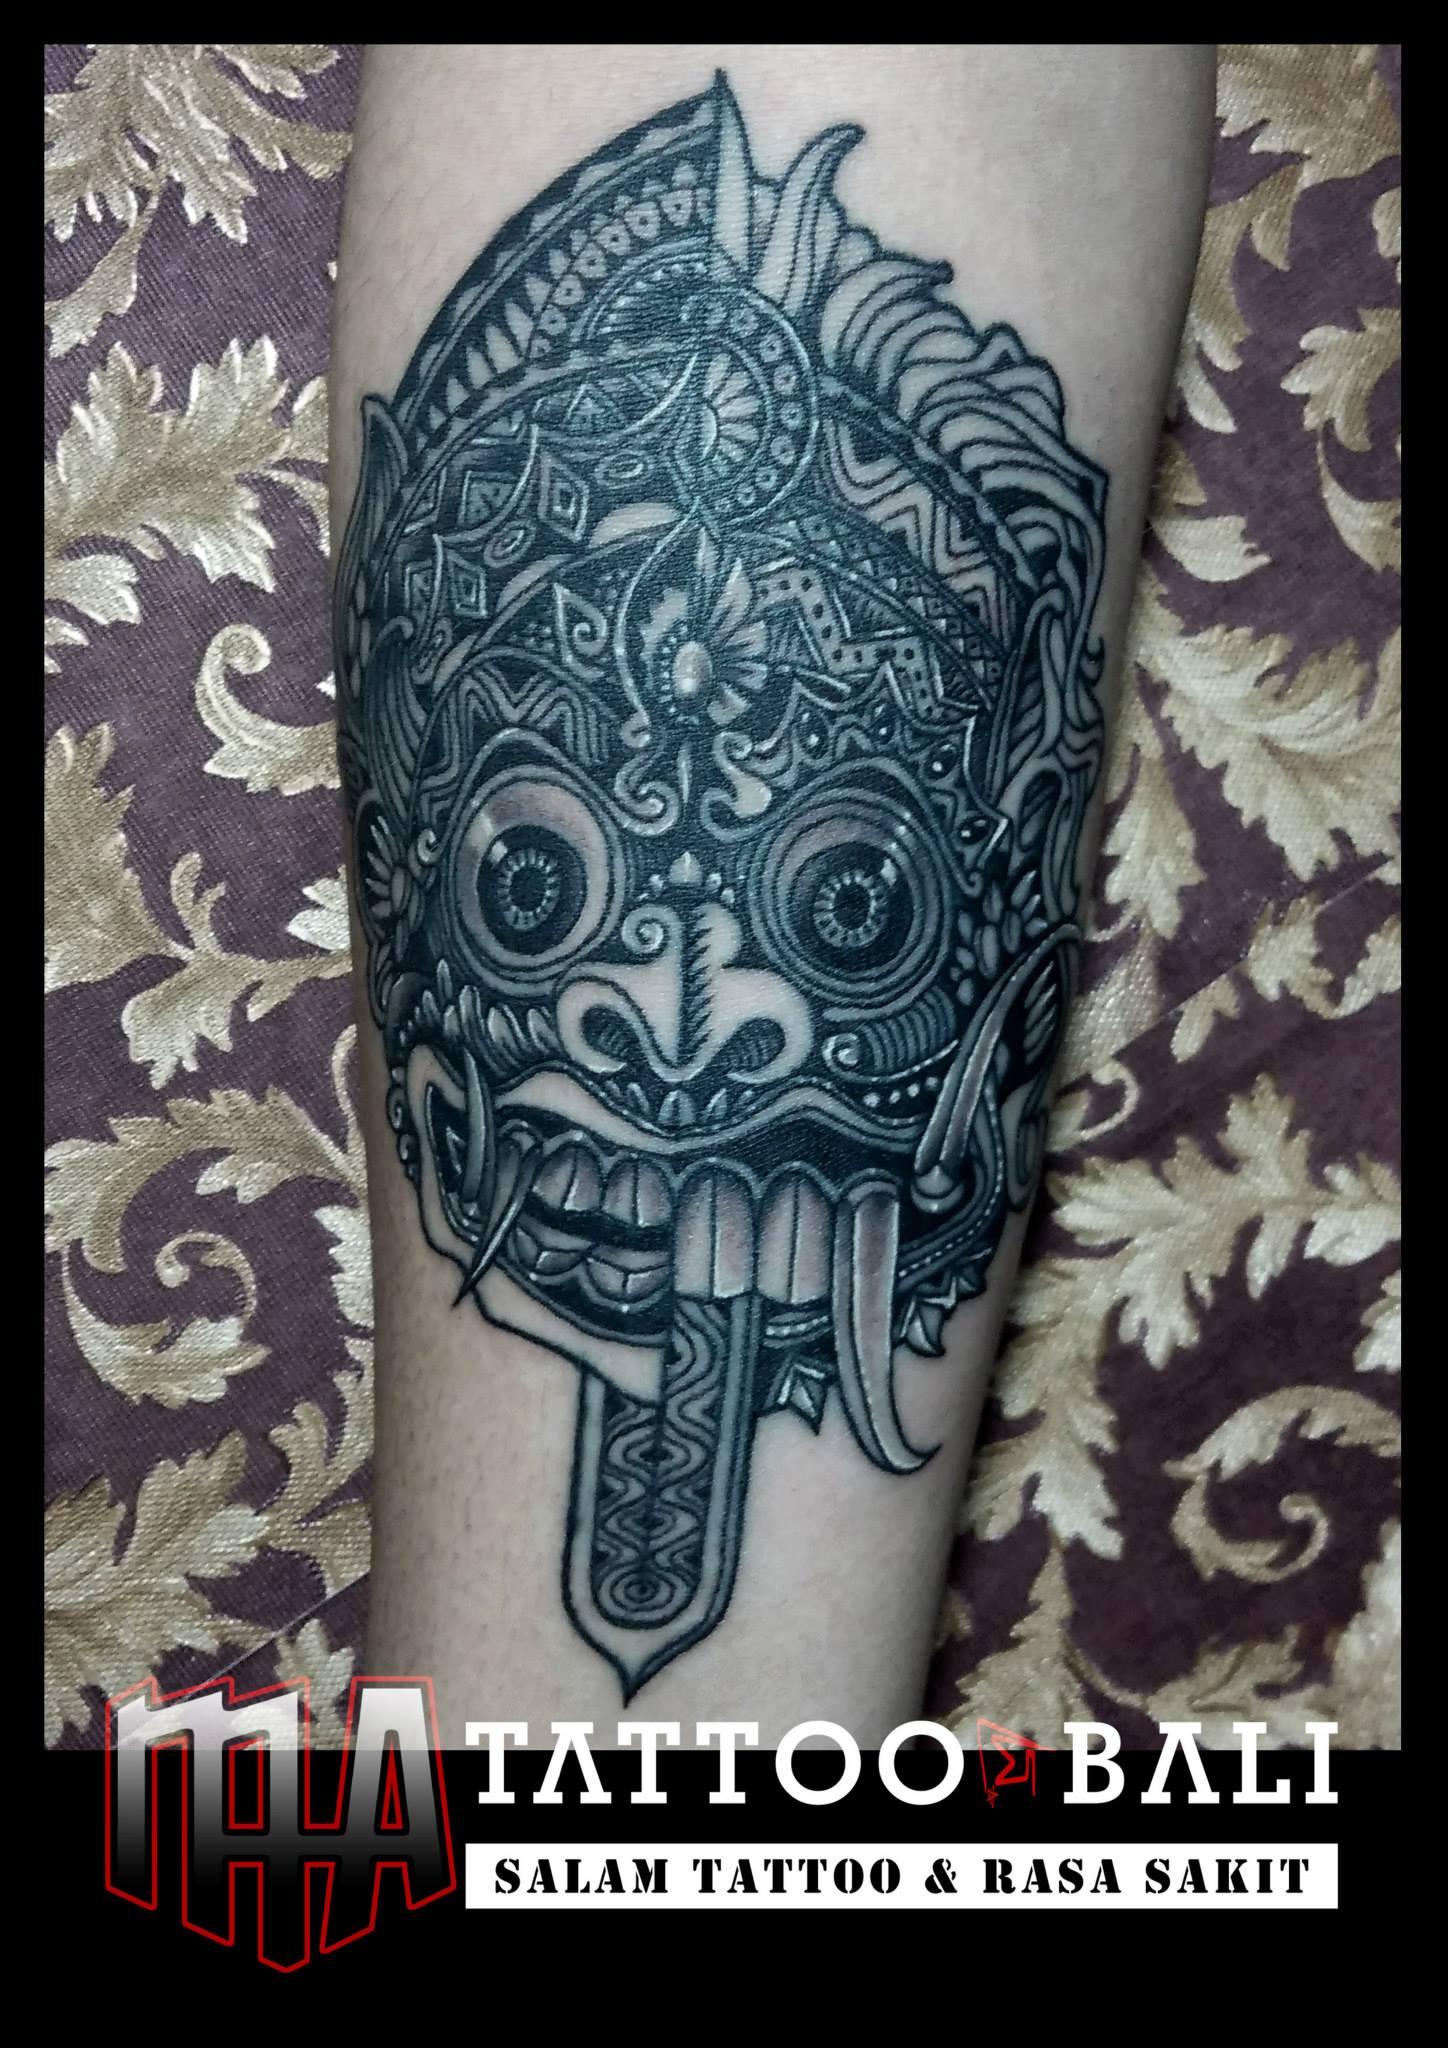 Balinese Tattoos Symbols Designs Pictures Tattlas Bali Tattoo